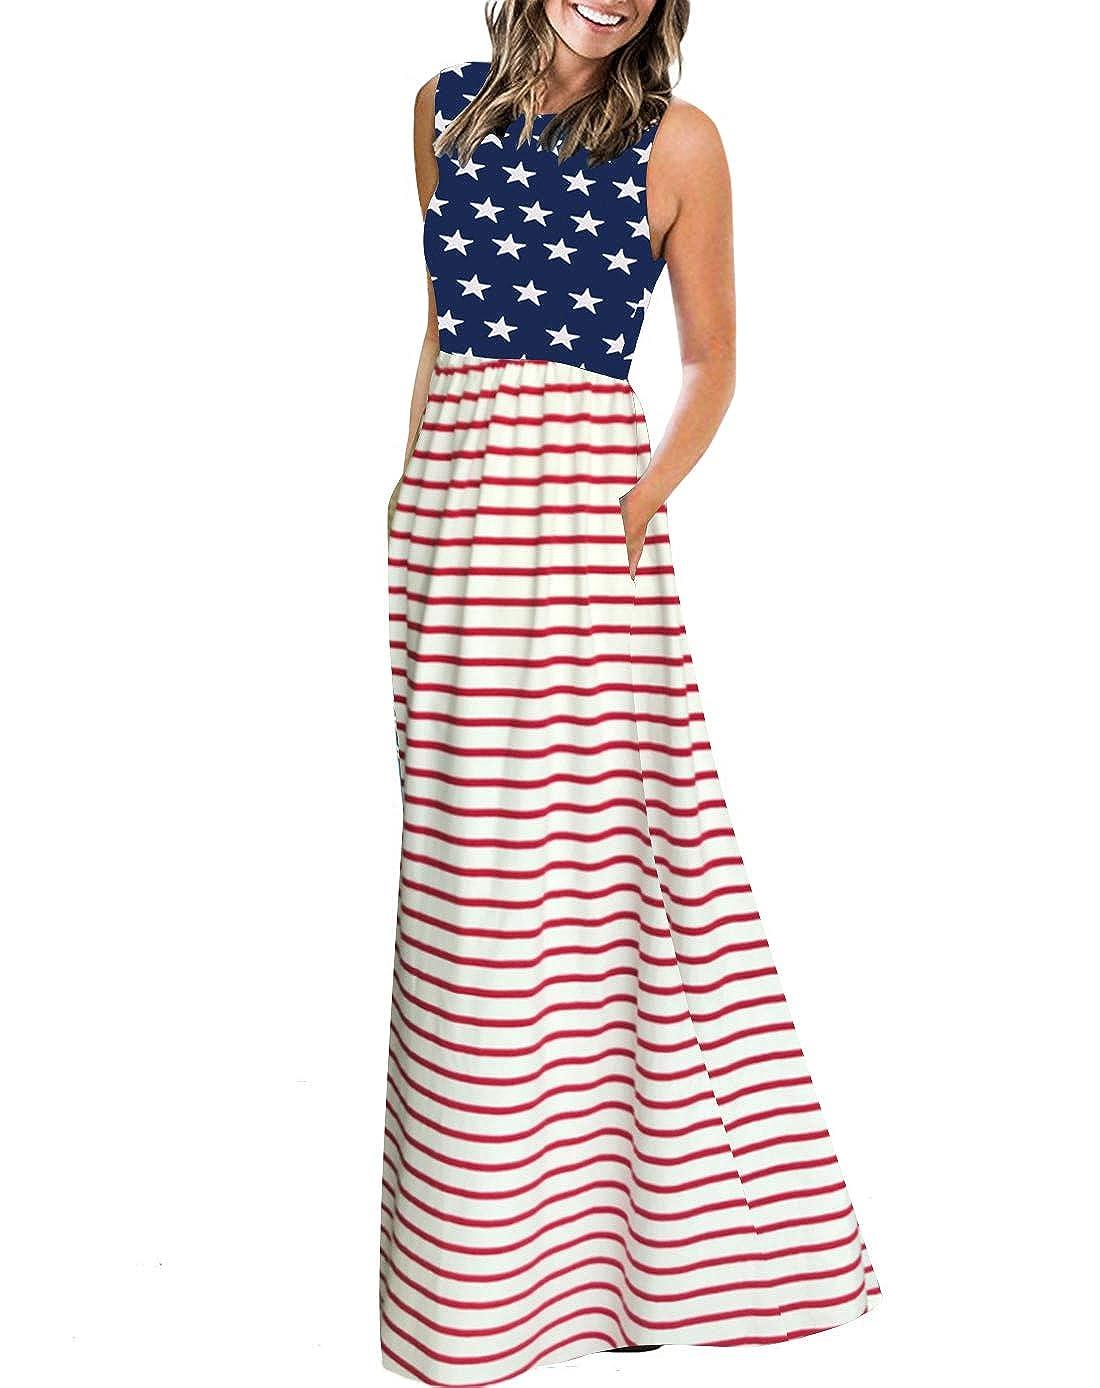 dcb9d4e3e562 ZESICA Women's Floral Print Long Sleeve Pockets Empire Waist Pleated Long  Maxi Dress at Amazon Women's Clothing store: